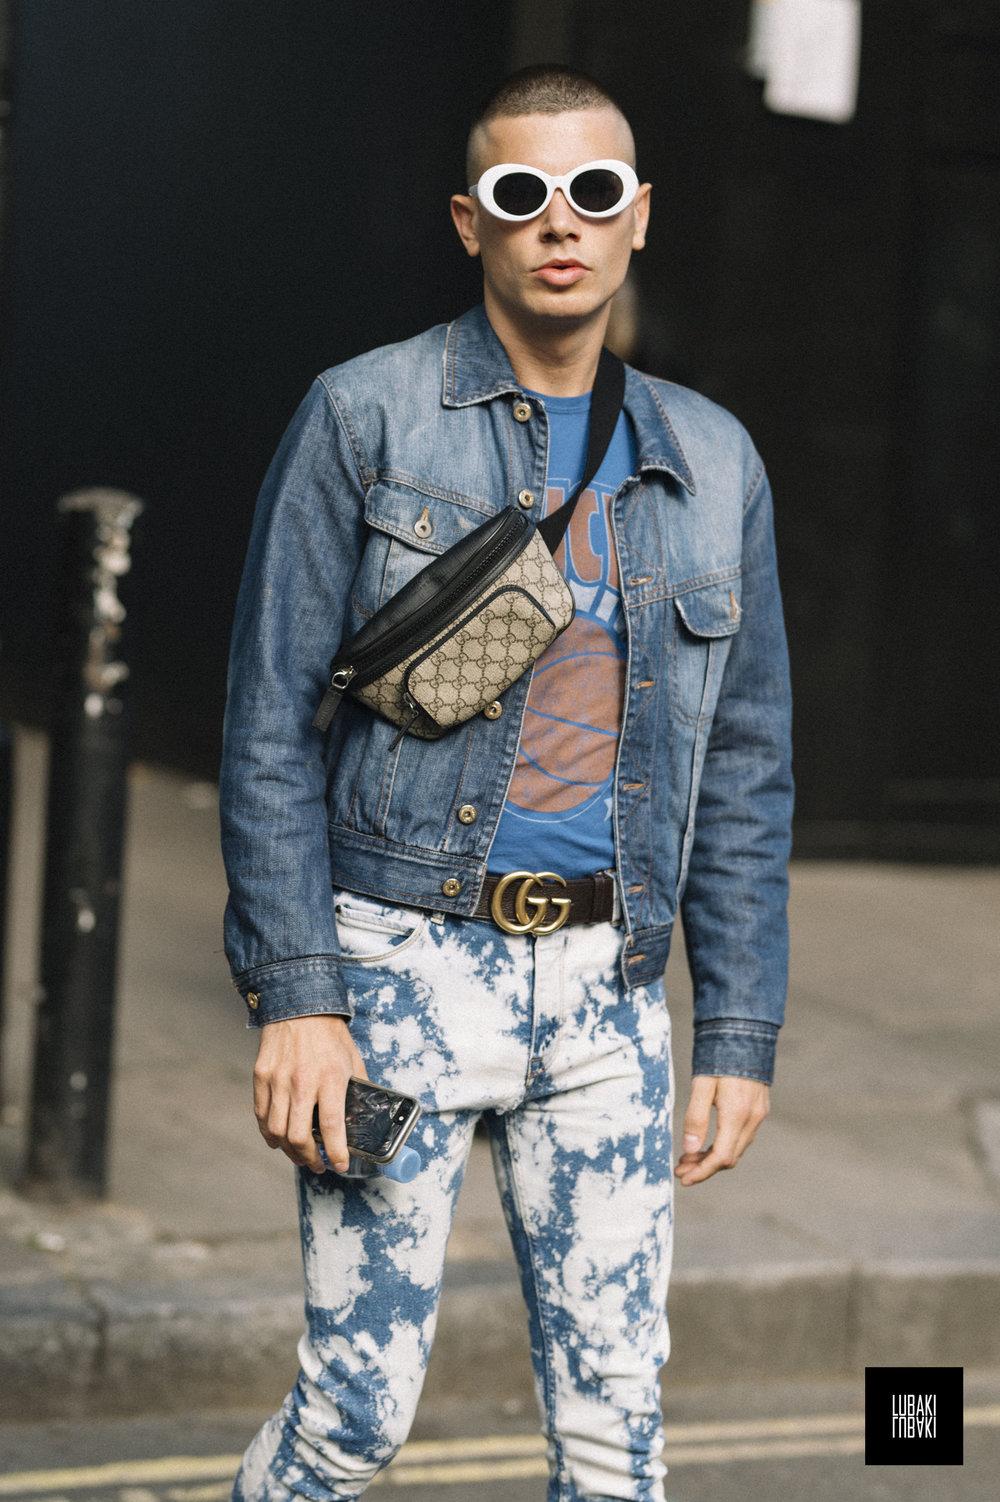 Max Katt - London